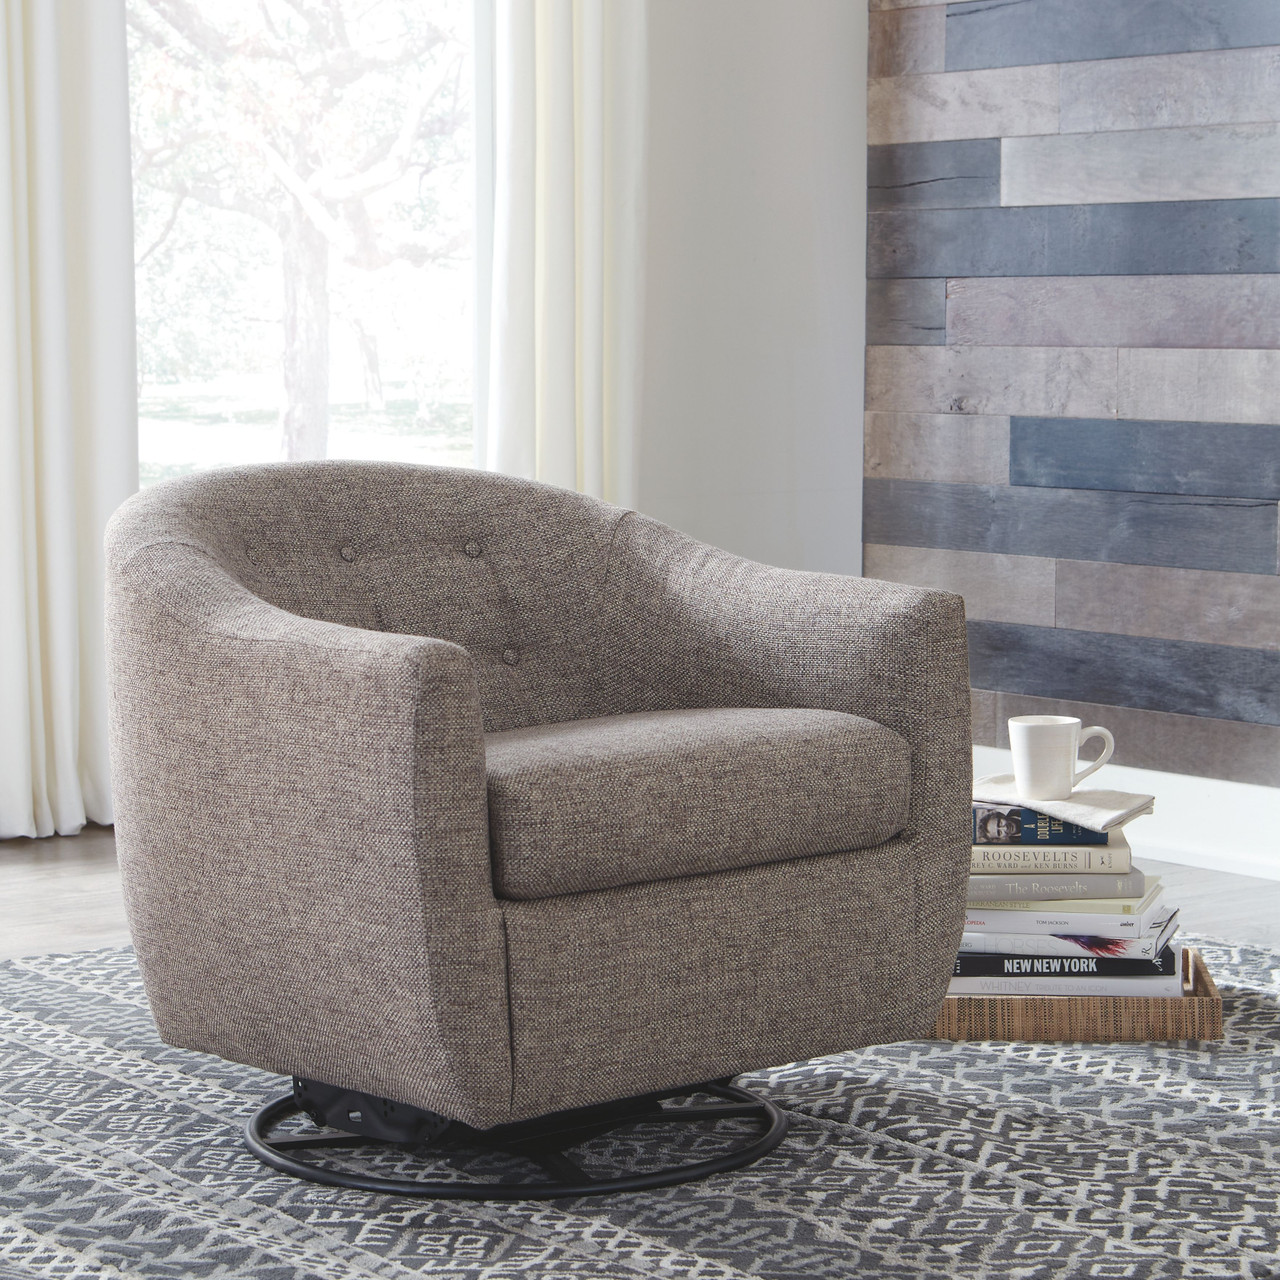 Enjoyable Upshur Taupe Swivel Glider Accent Chair Dailytribune Chair Design For Home Dailytribuneorg